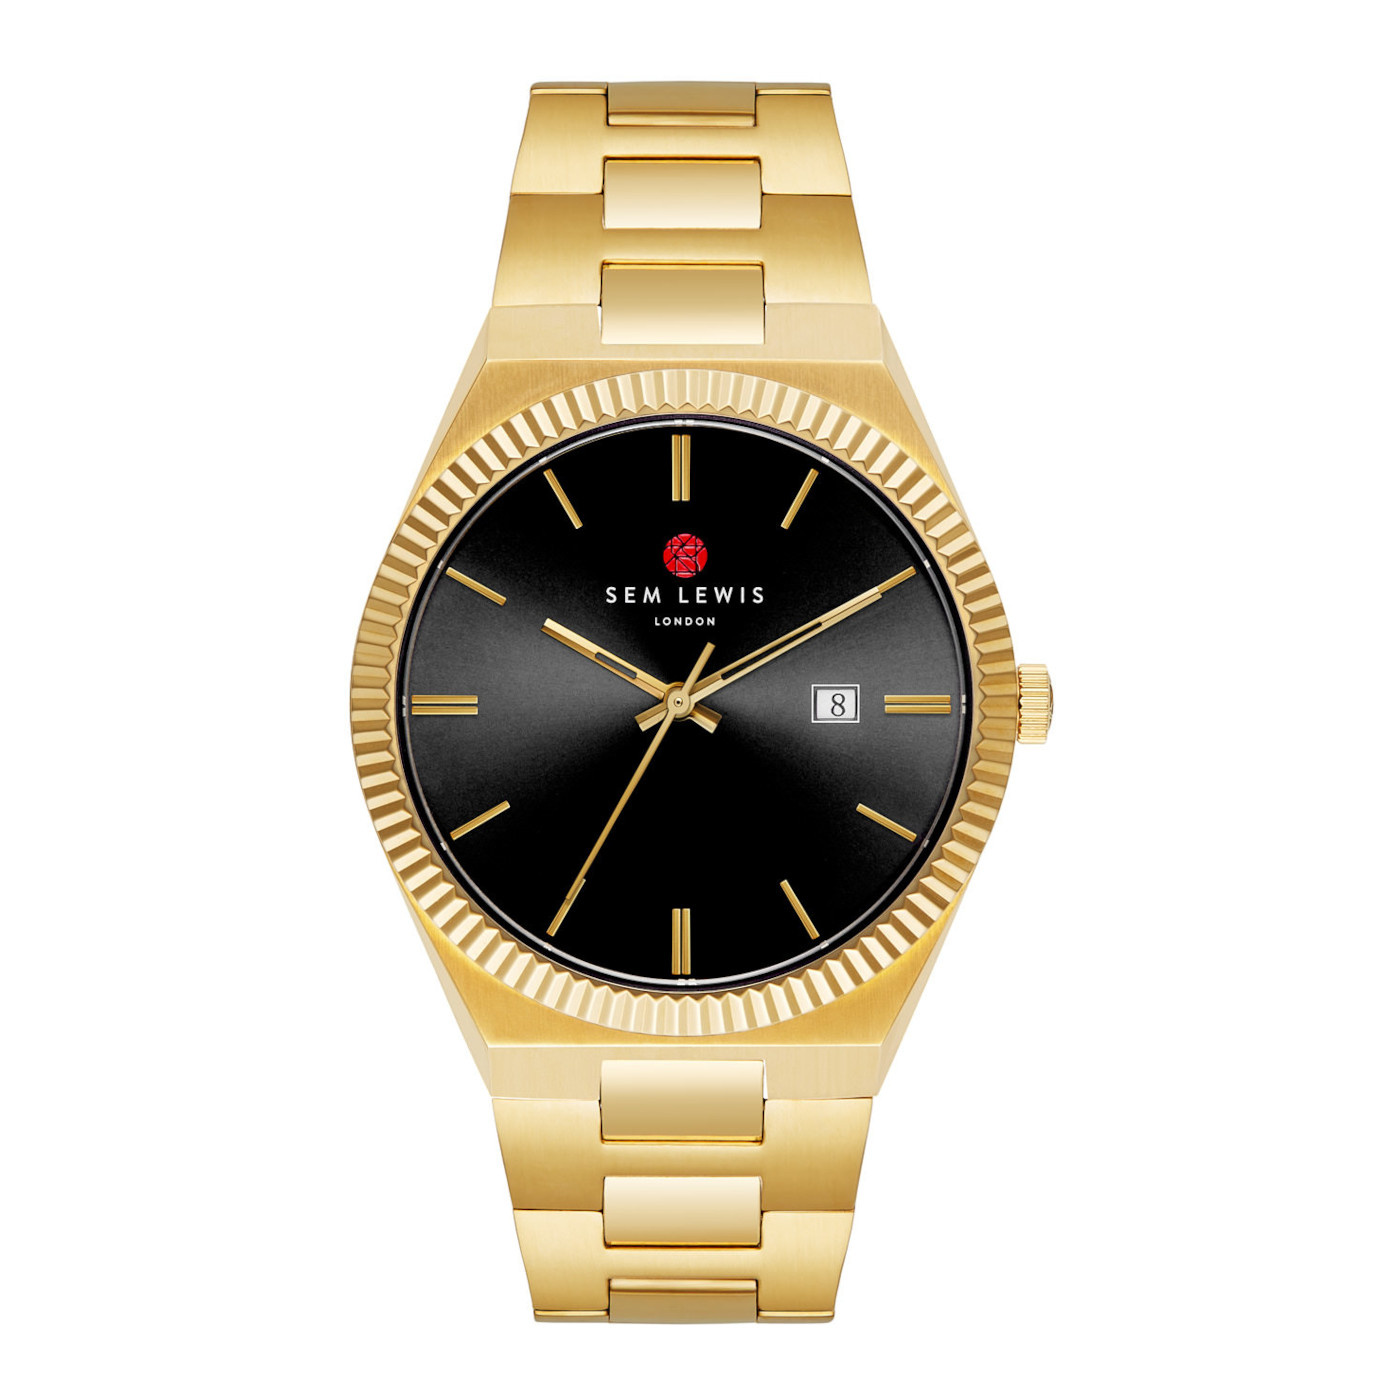 Sem Lewis Aldgate watch black/gold colored